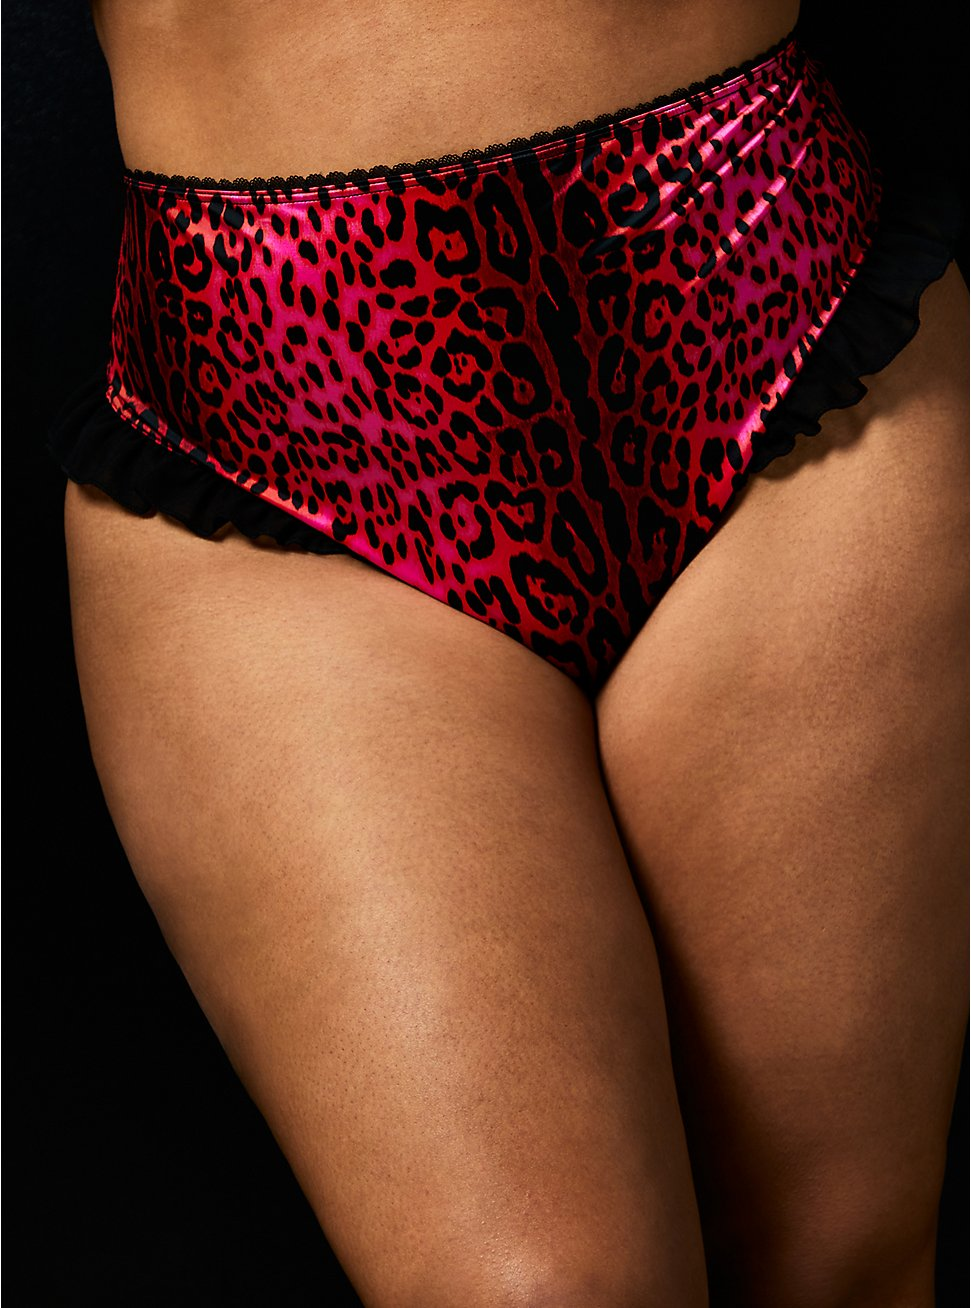 Betsey Johnson Hot Pink Leopard Satin Ruffle Back Slit High Waist Panty , LEOPARD ROSE BUD, hi-res